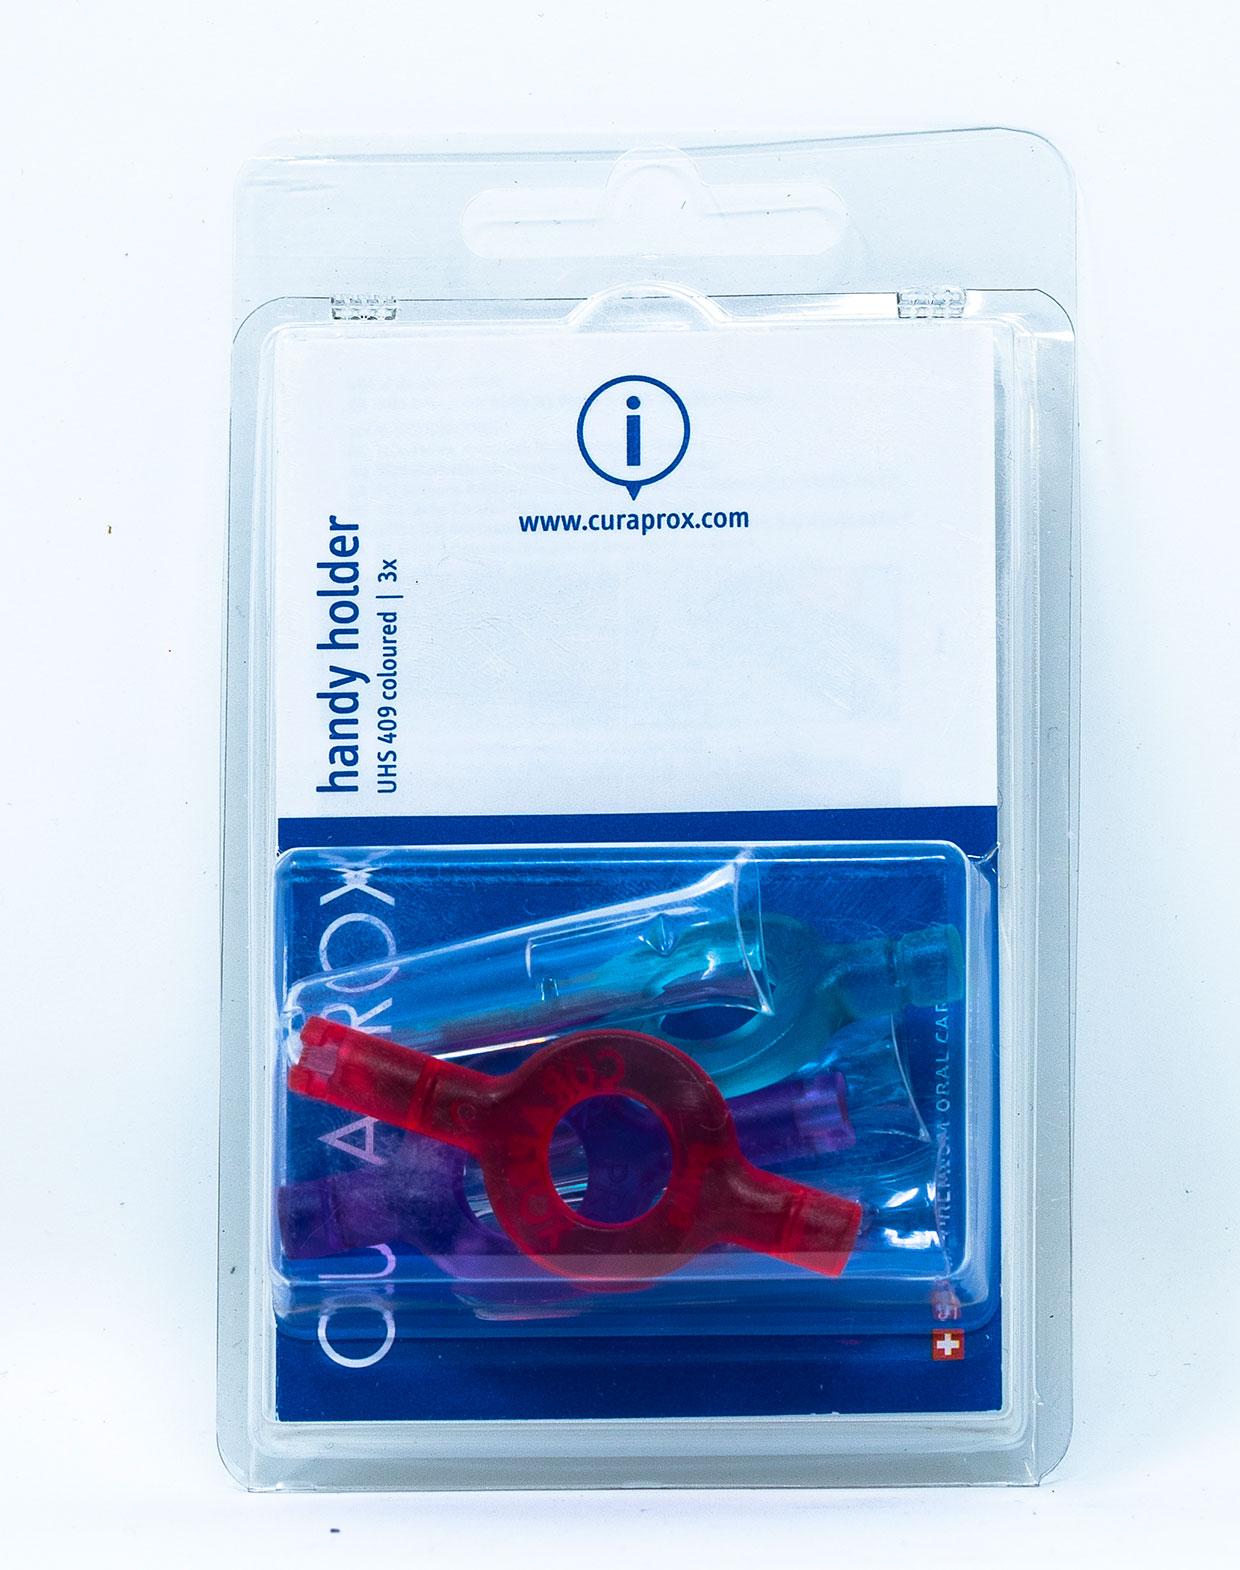 Curaprox Manico Handy UHS 409 - 3 pz